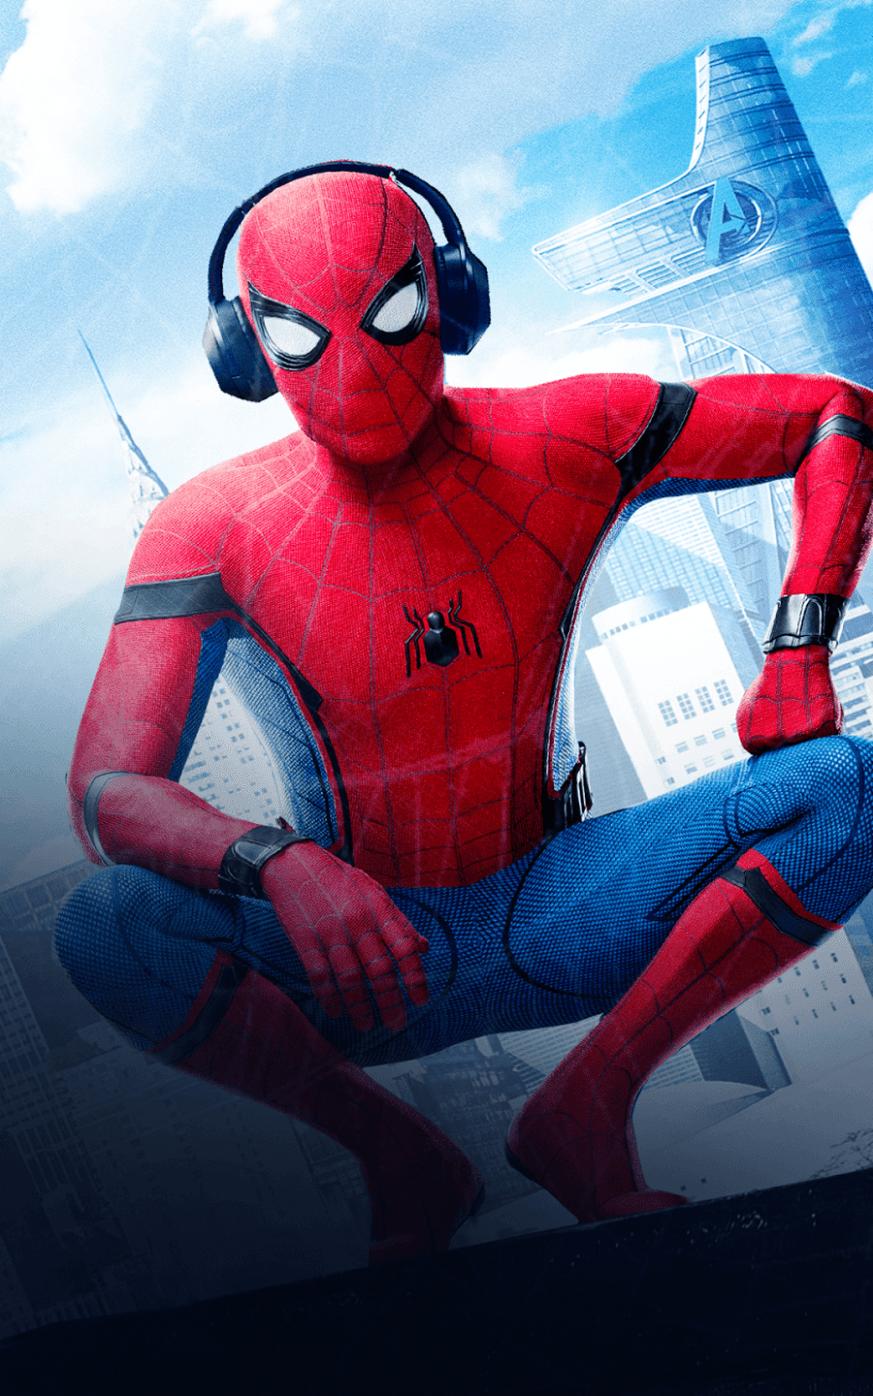 Spiderman Homecoming Streamkiste